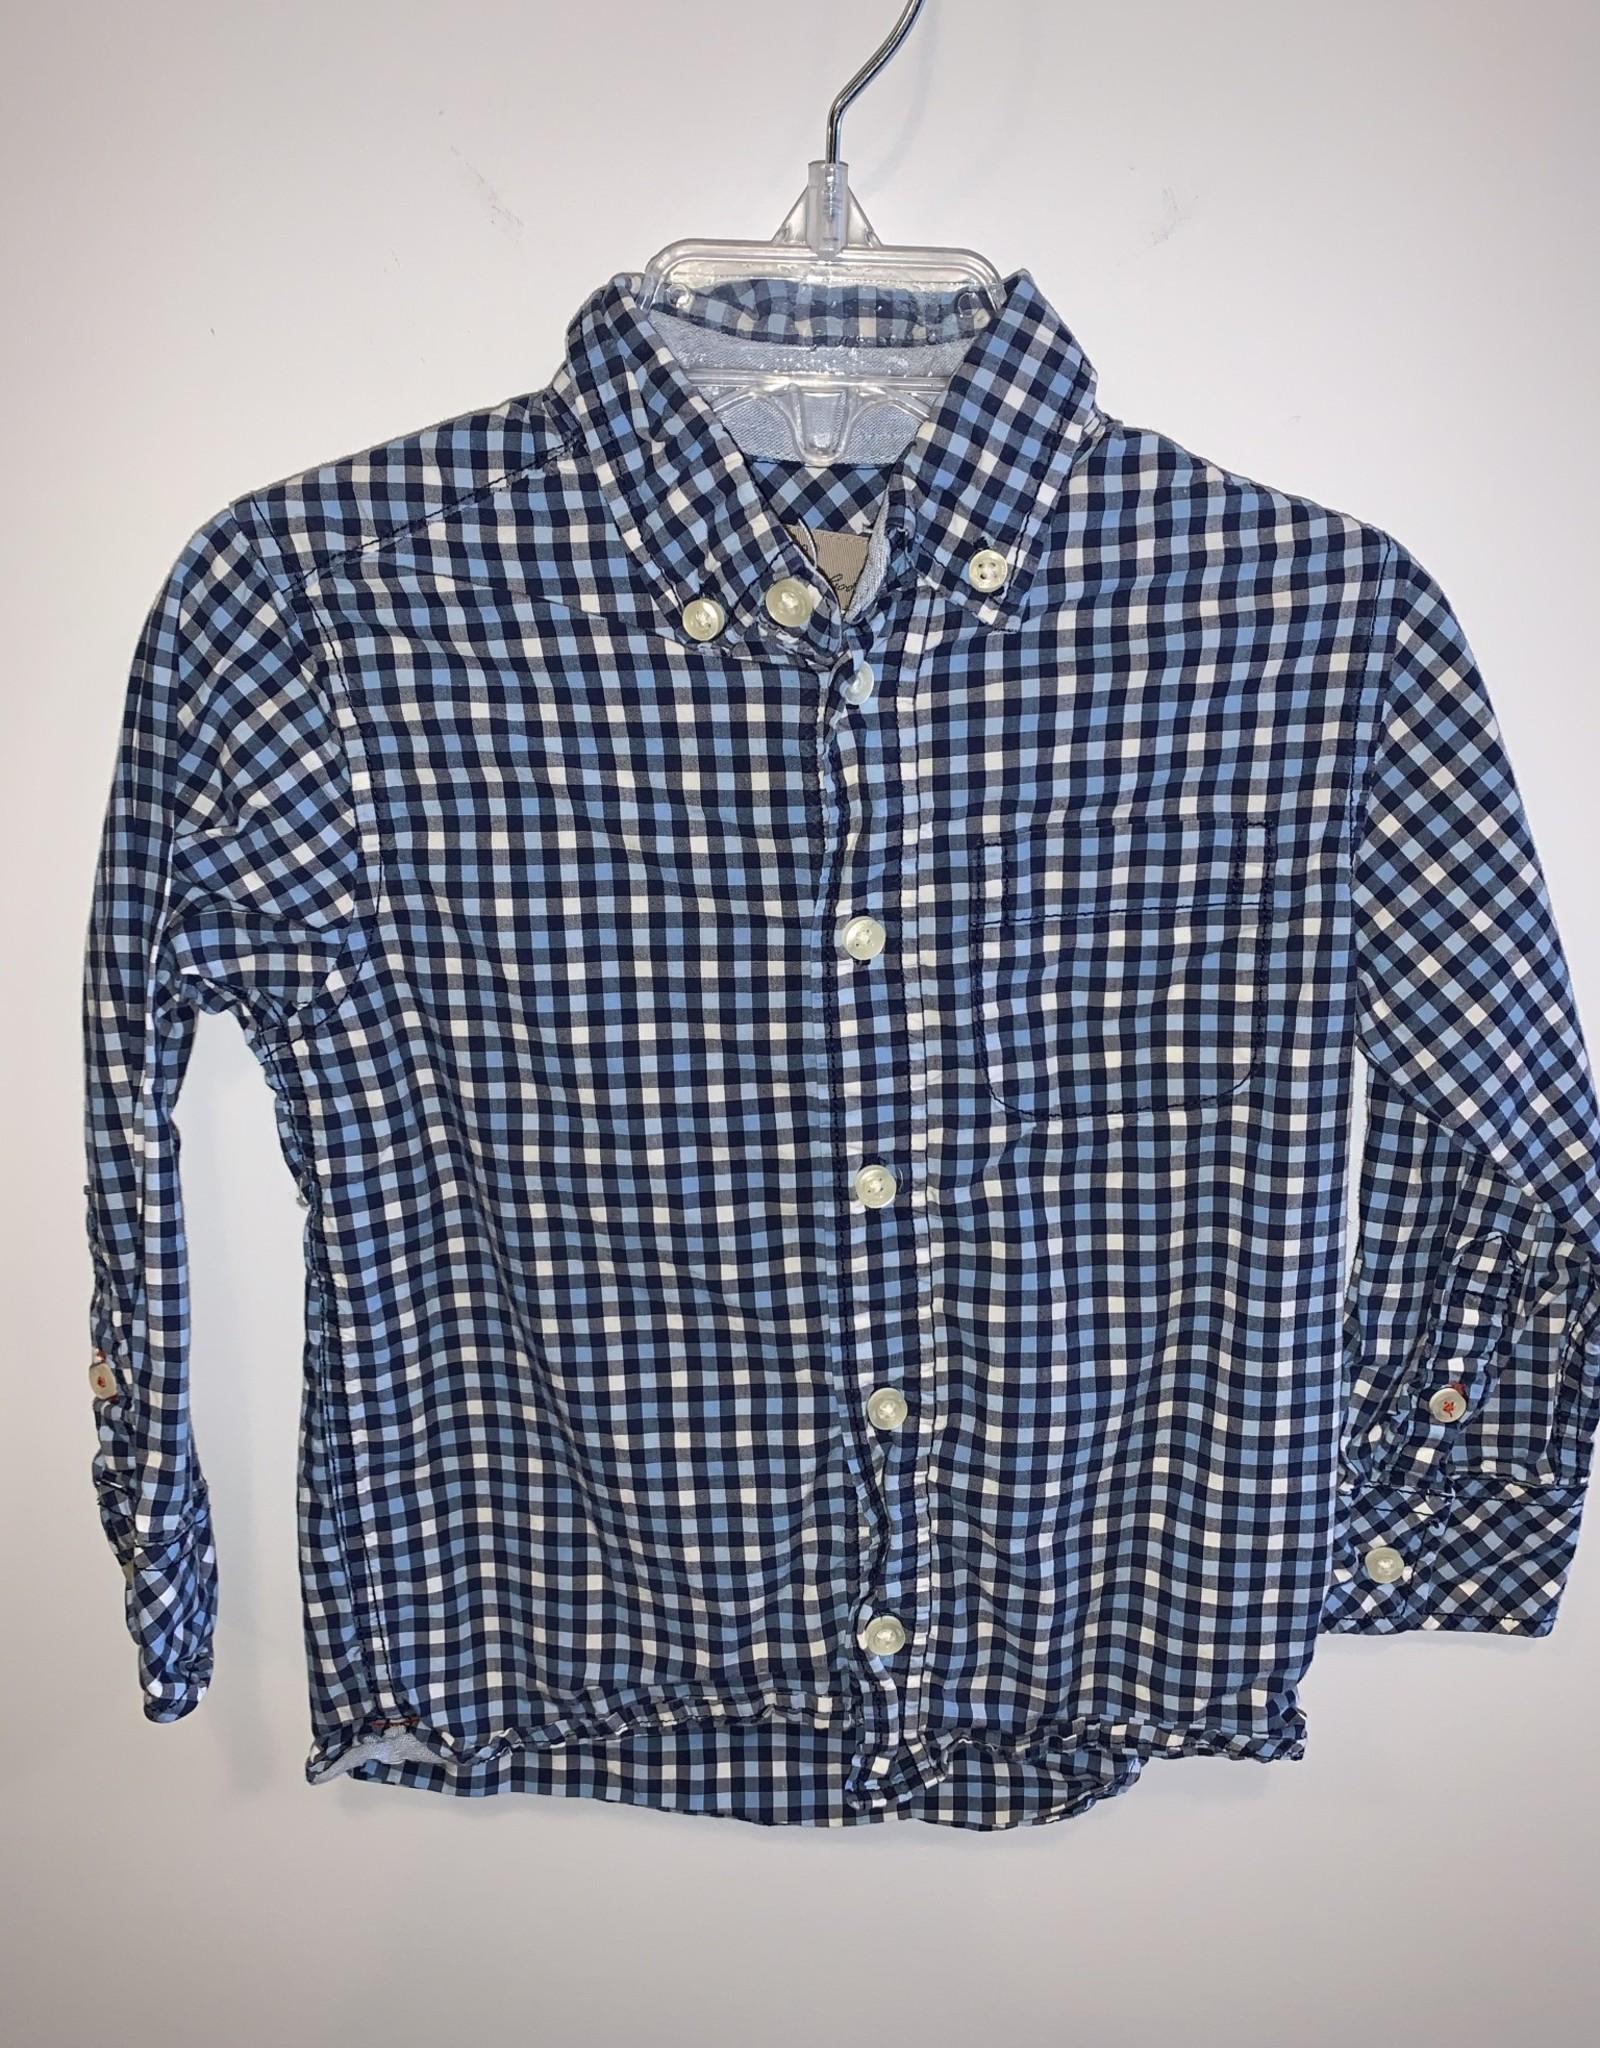 H&M Boys/18-24/H&M/Shirt